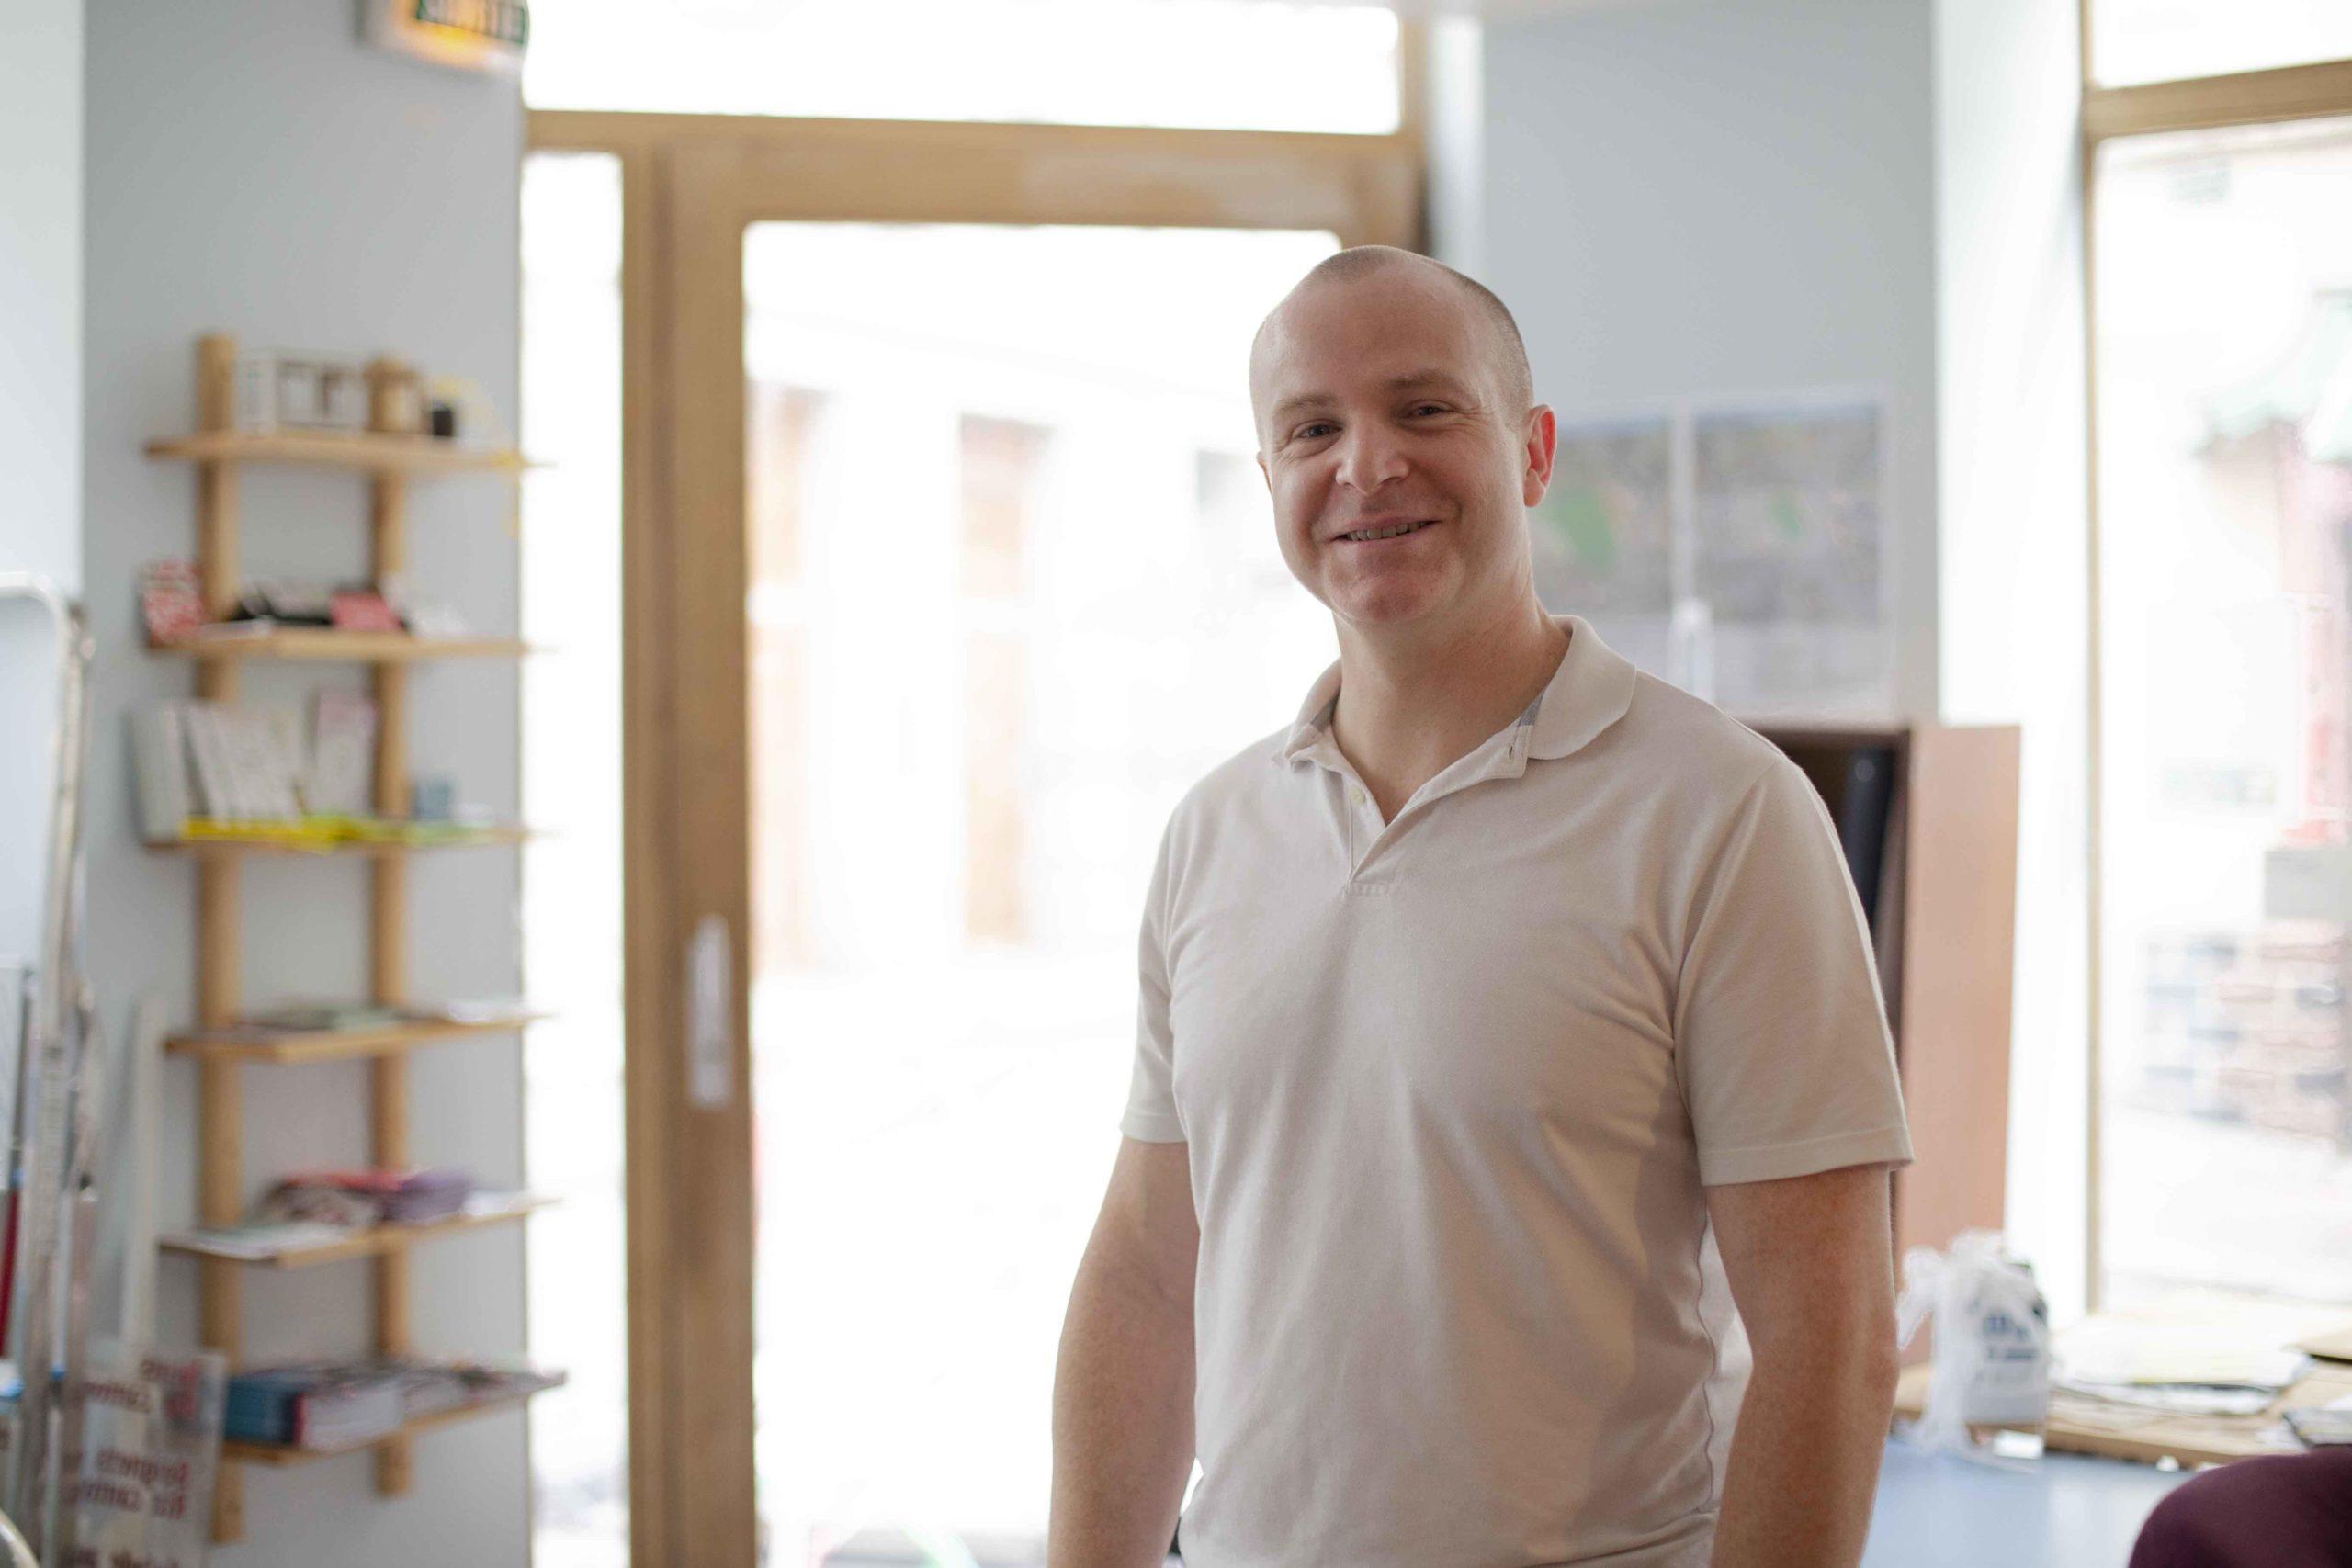 Interview de Nicolas Herbepin, praticien en massage bien-être